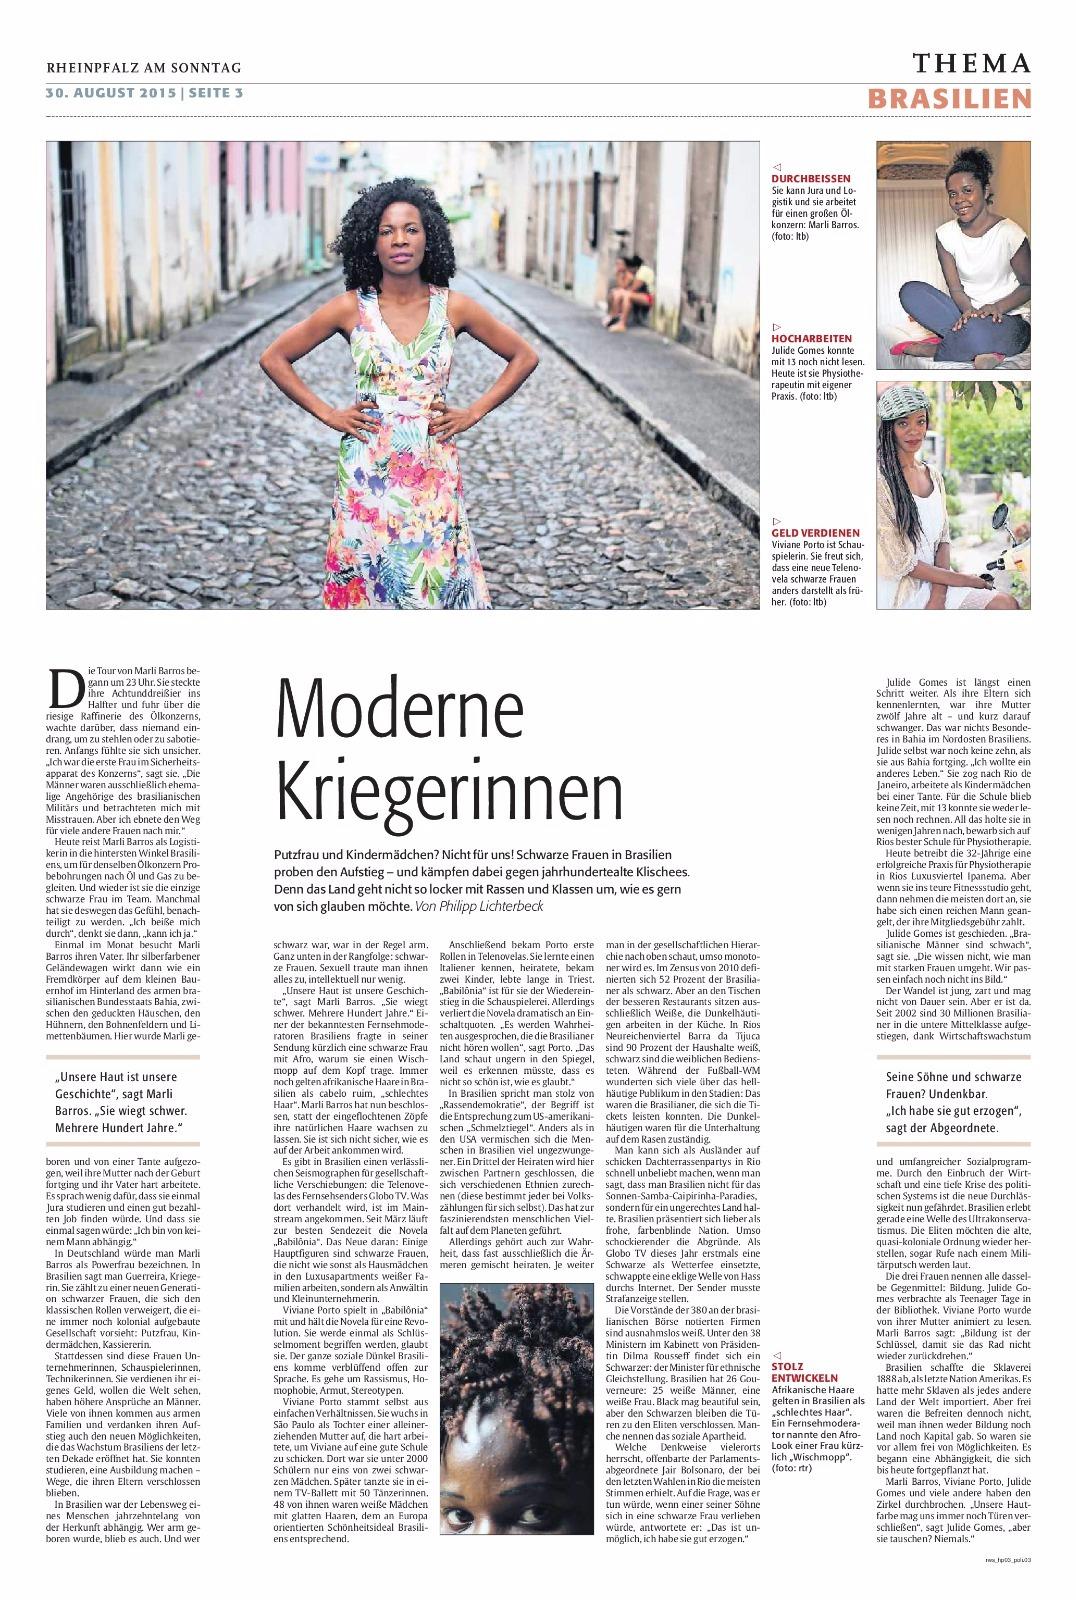 Jornal Rheinpfalz Alemanha pag 3